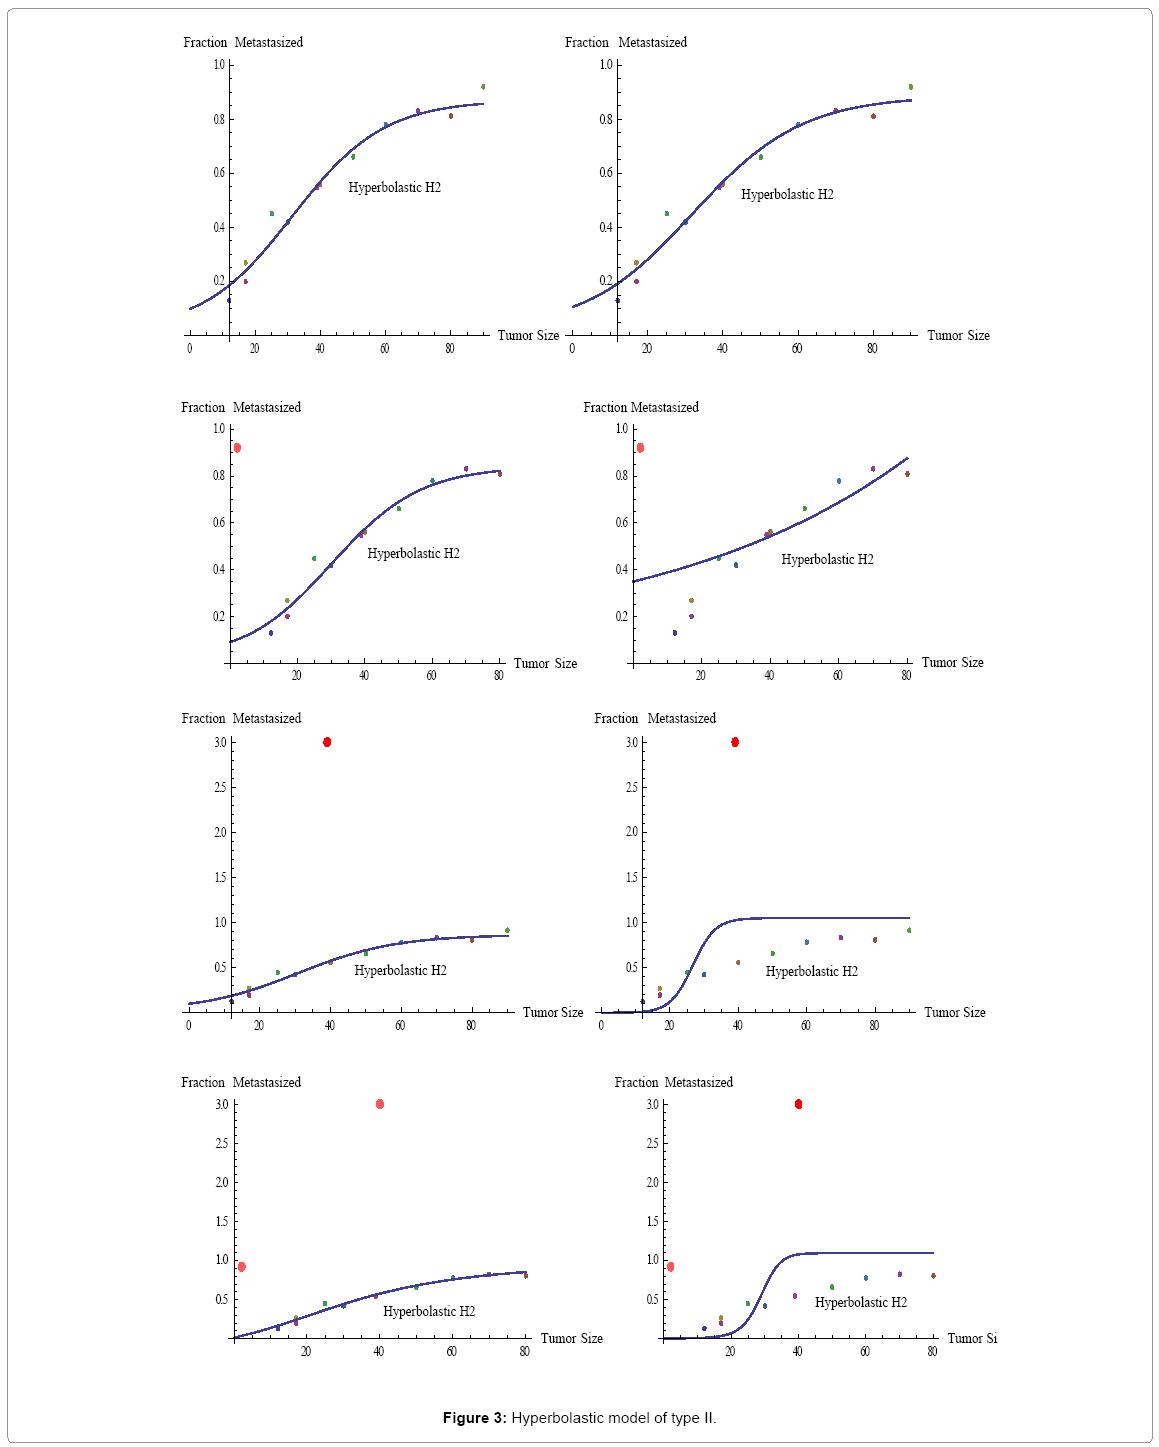 biometrics-biostatistics-hyperbolastic-model